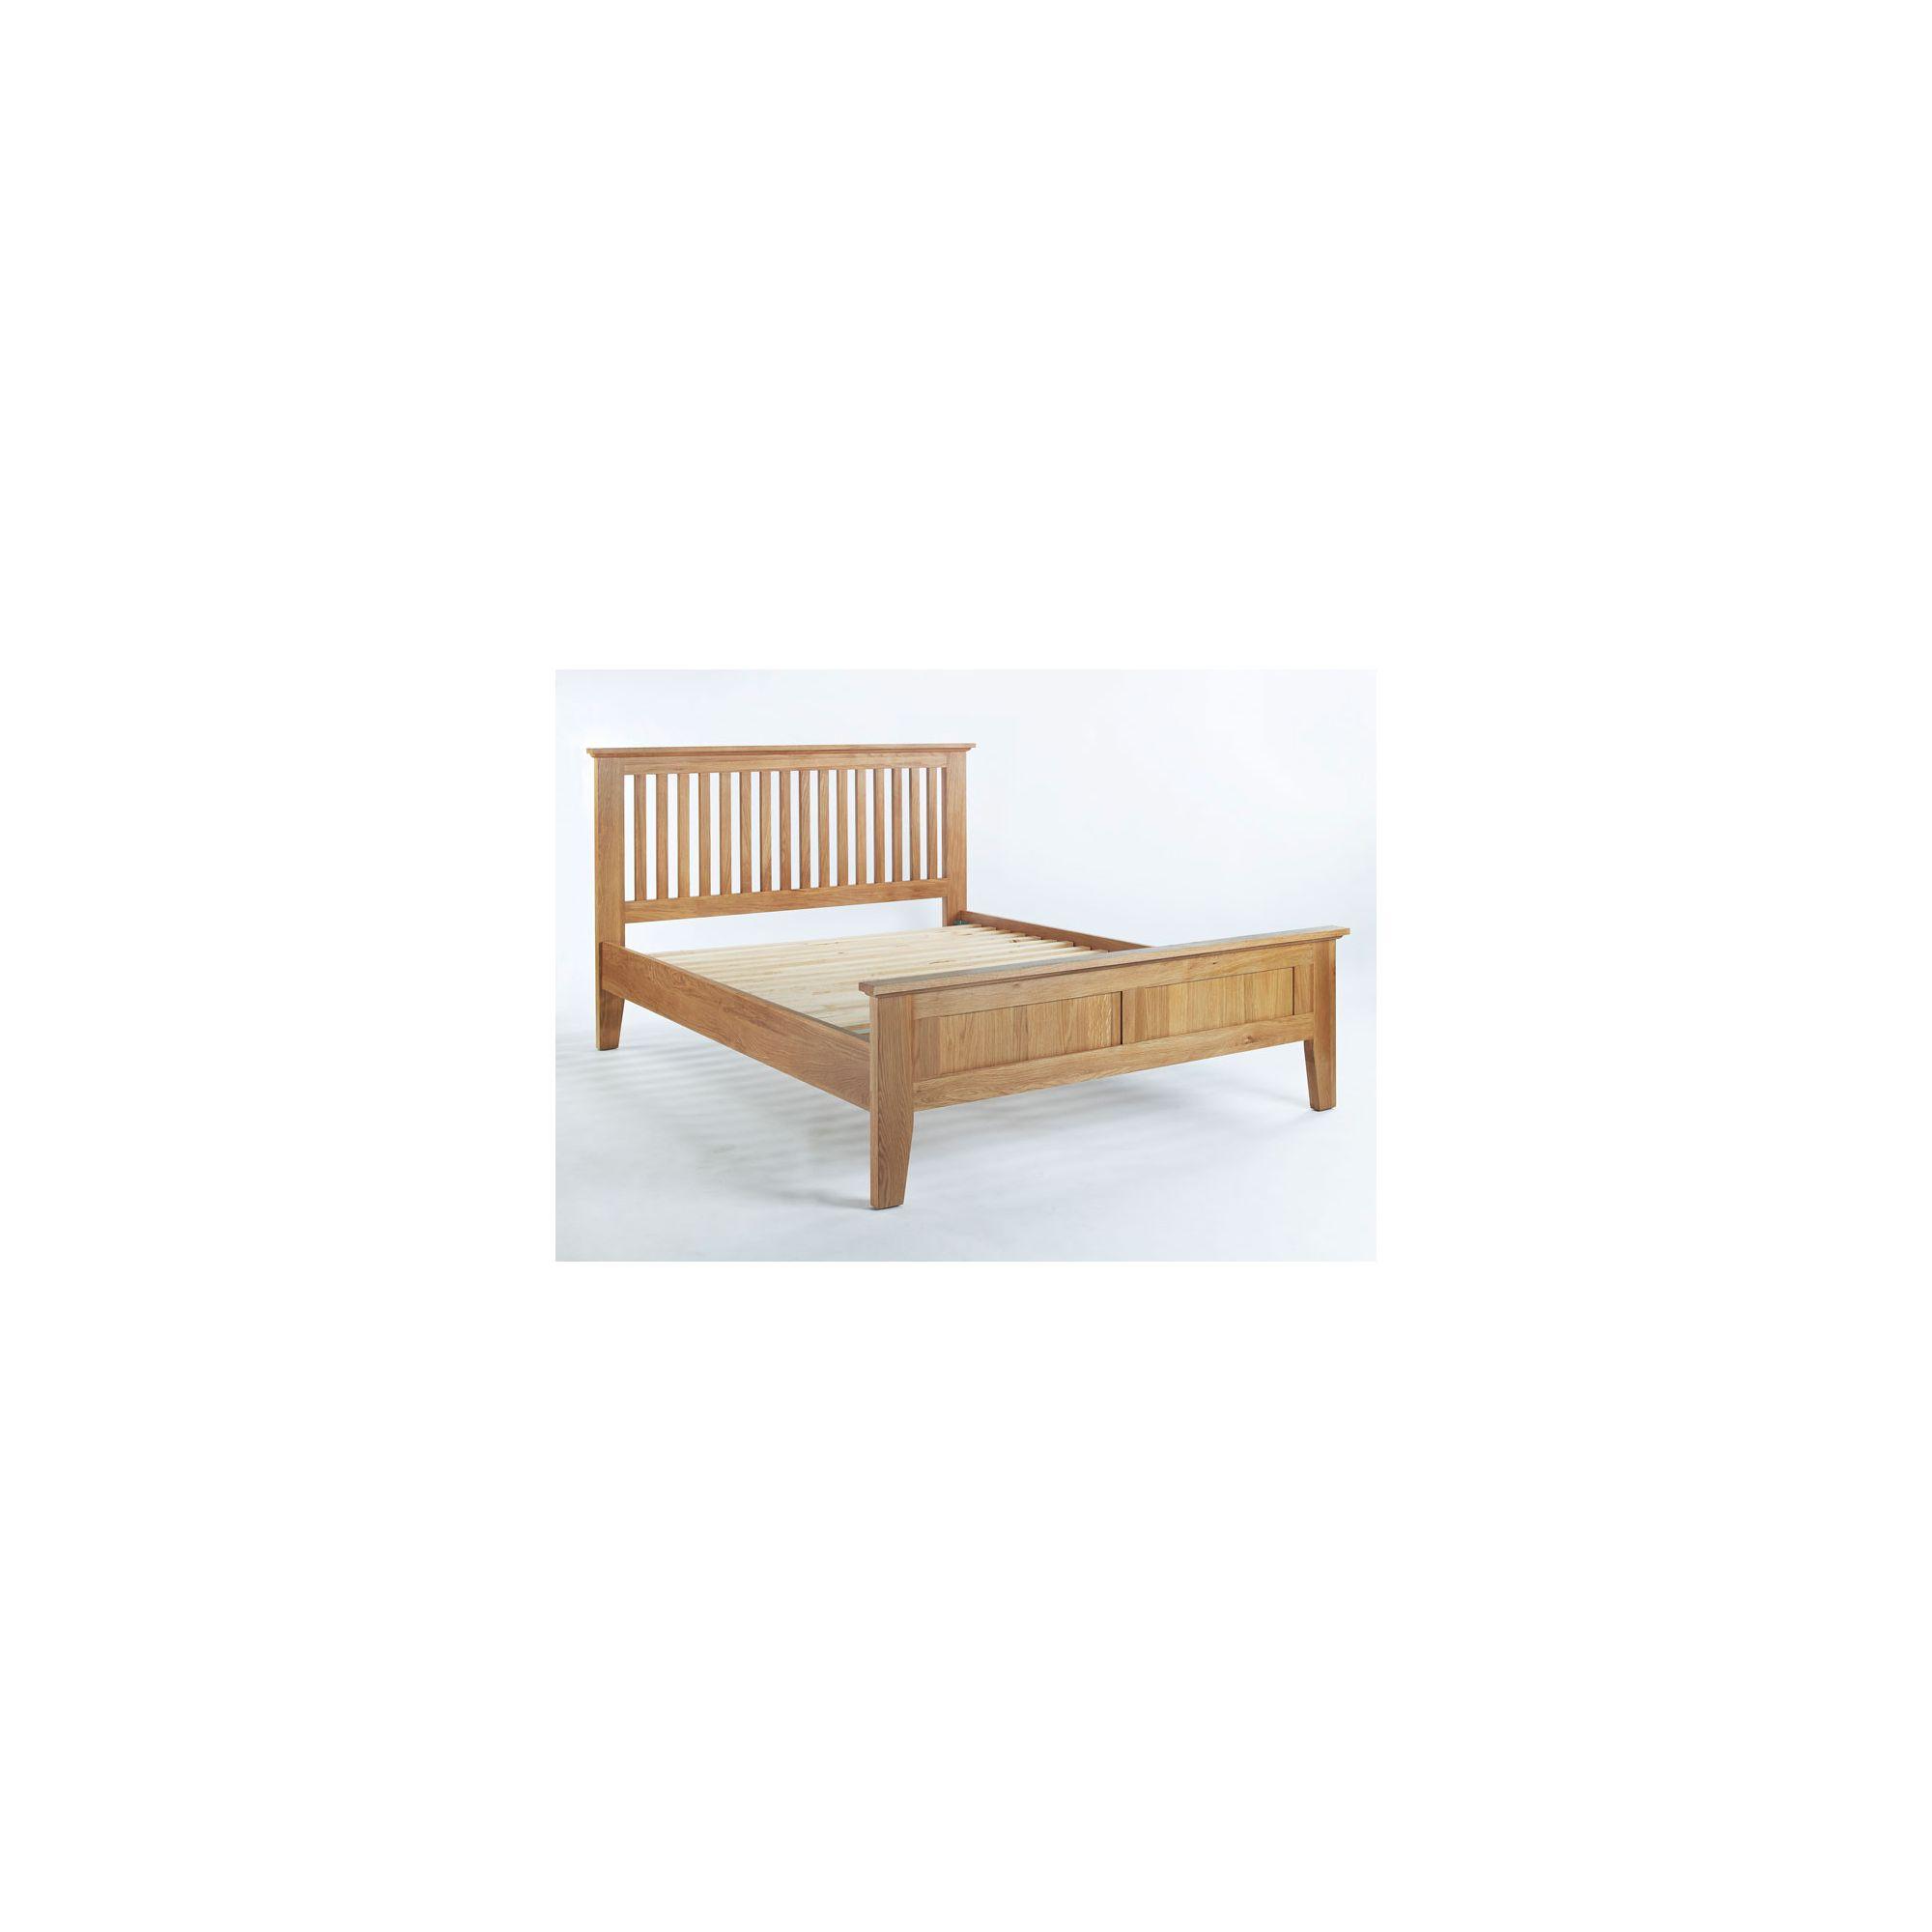 Ametis Sherwood Oak Bed Frame - Double at Tesco Direct